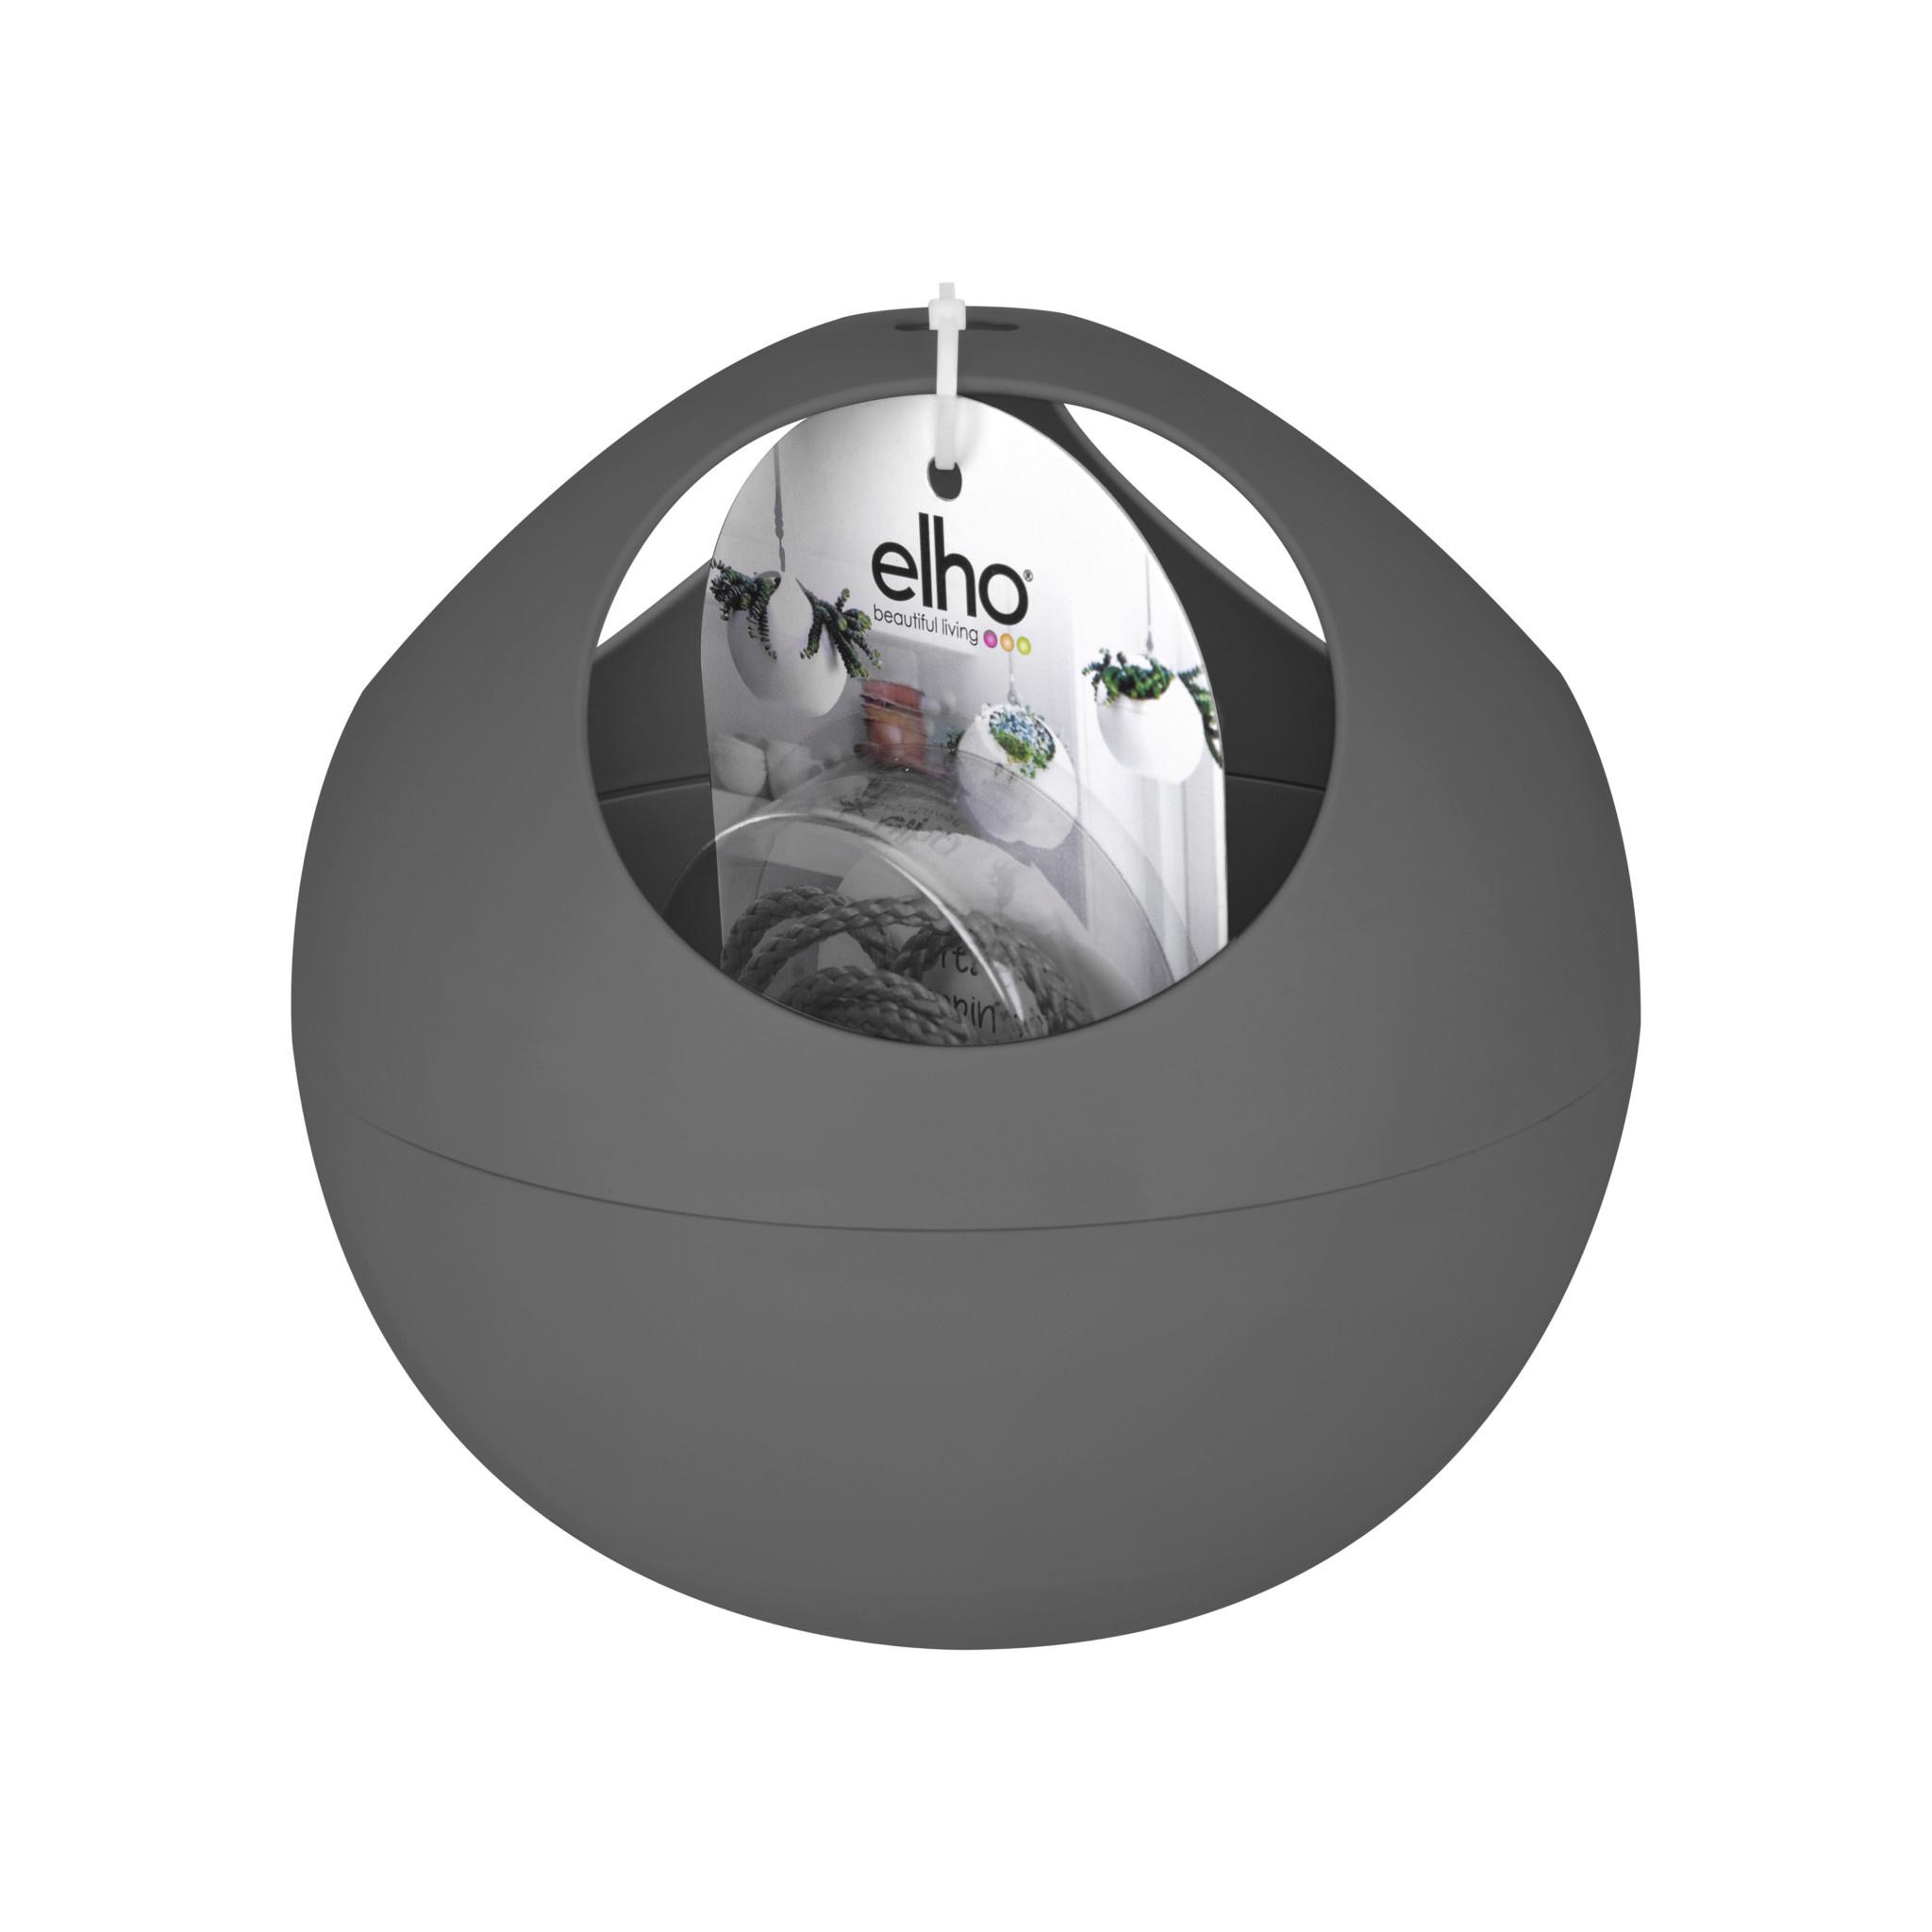 Elho2021 B.For Soft Air